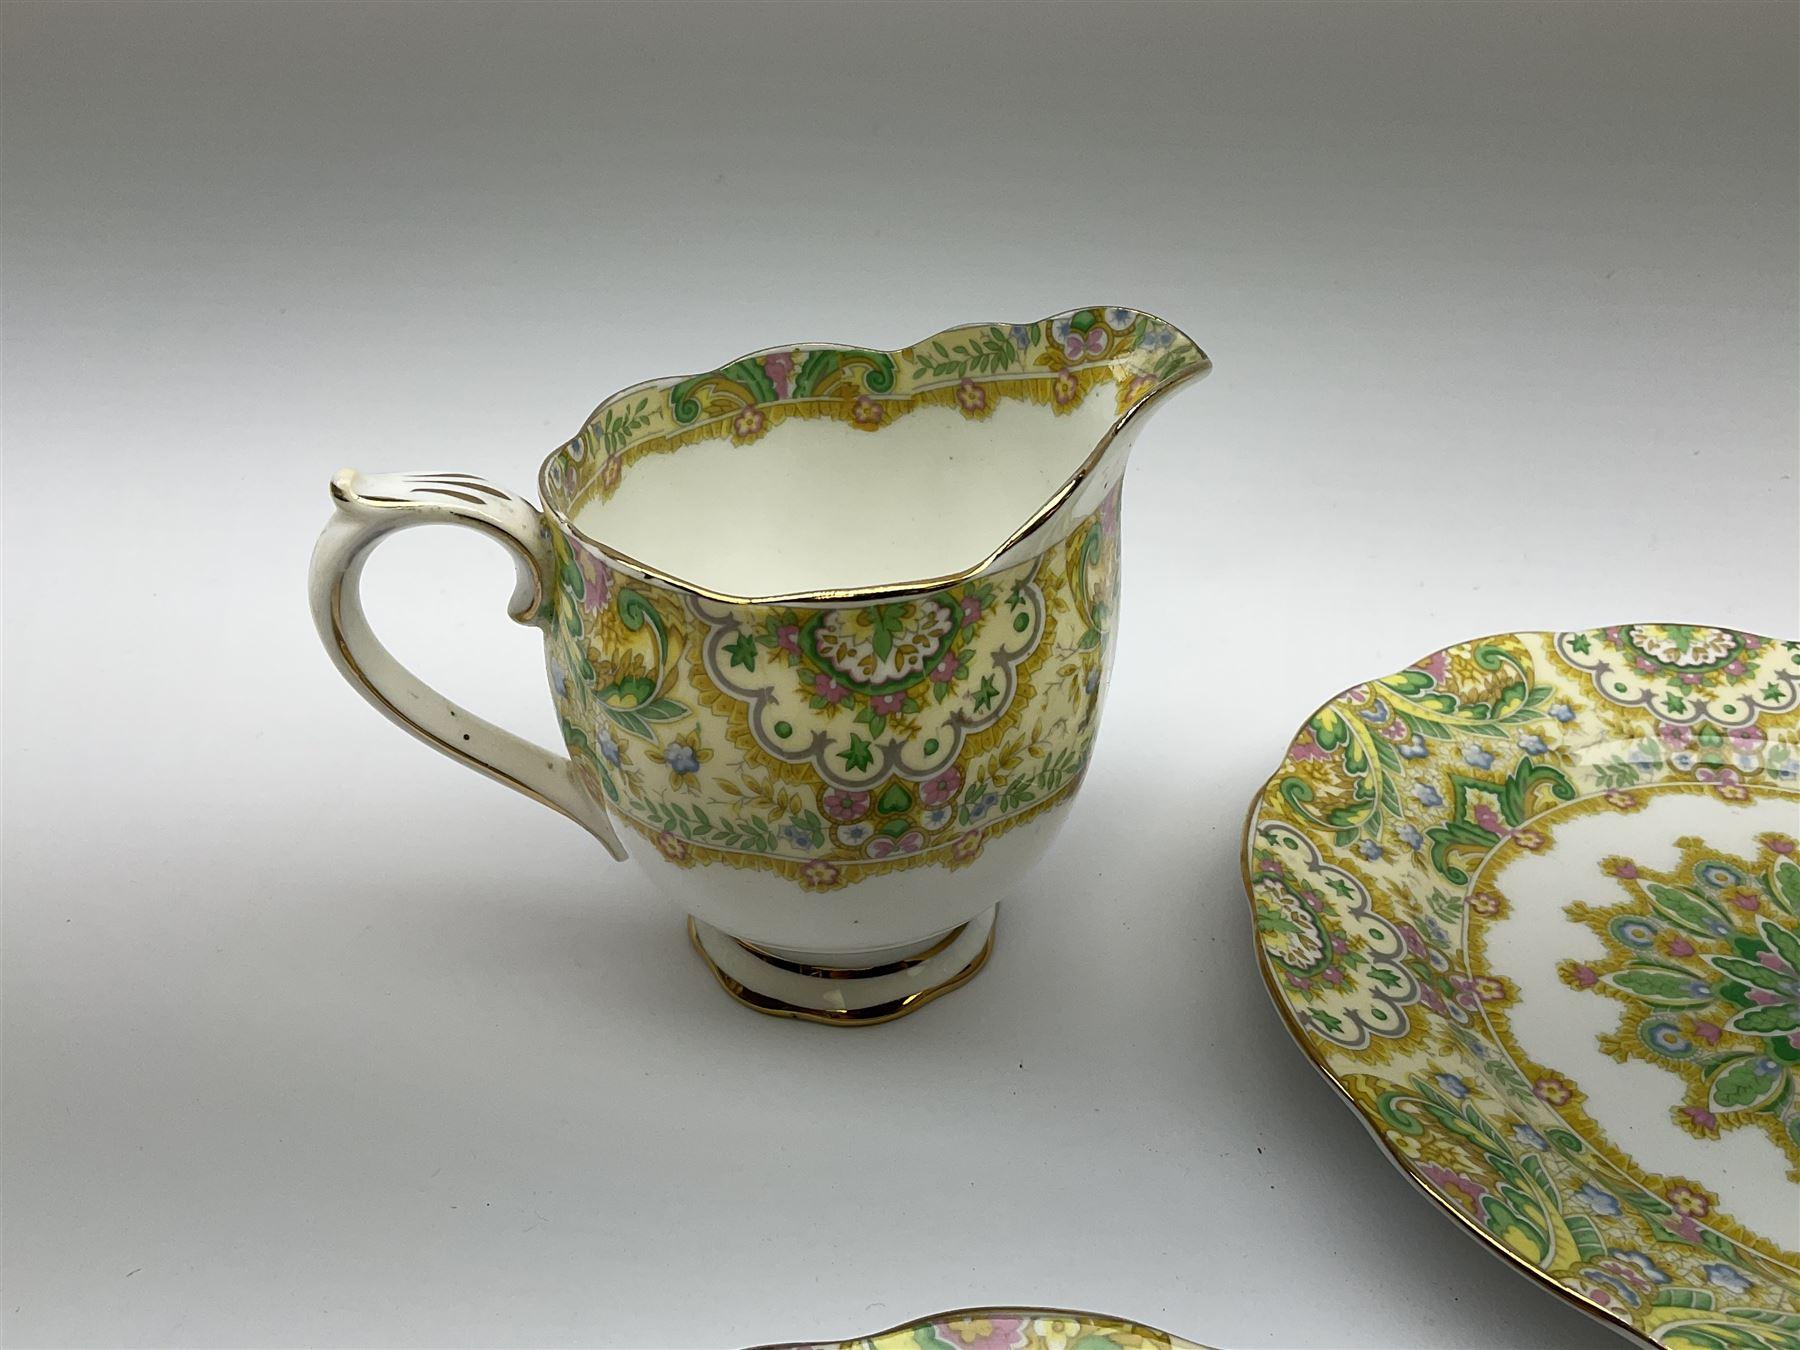 Royal Albert 'Paisley Shawl' pattern part tea set - Image 10 of 12